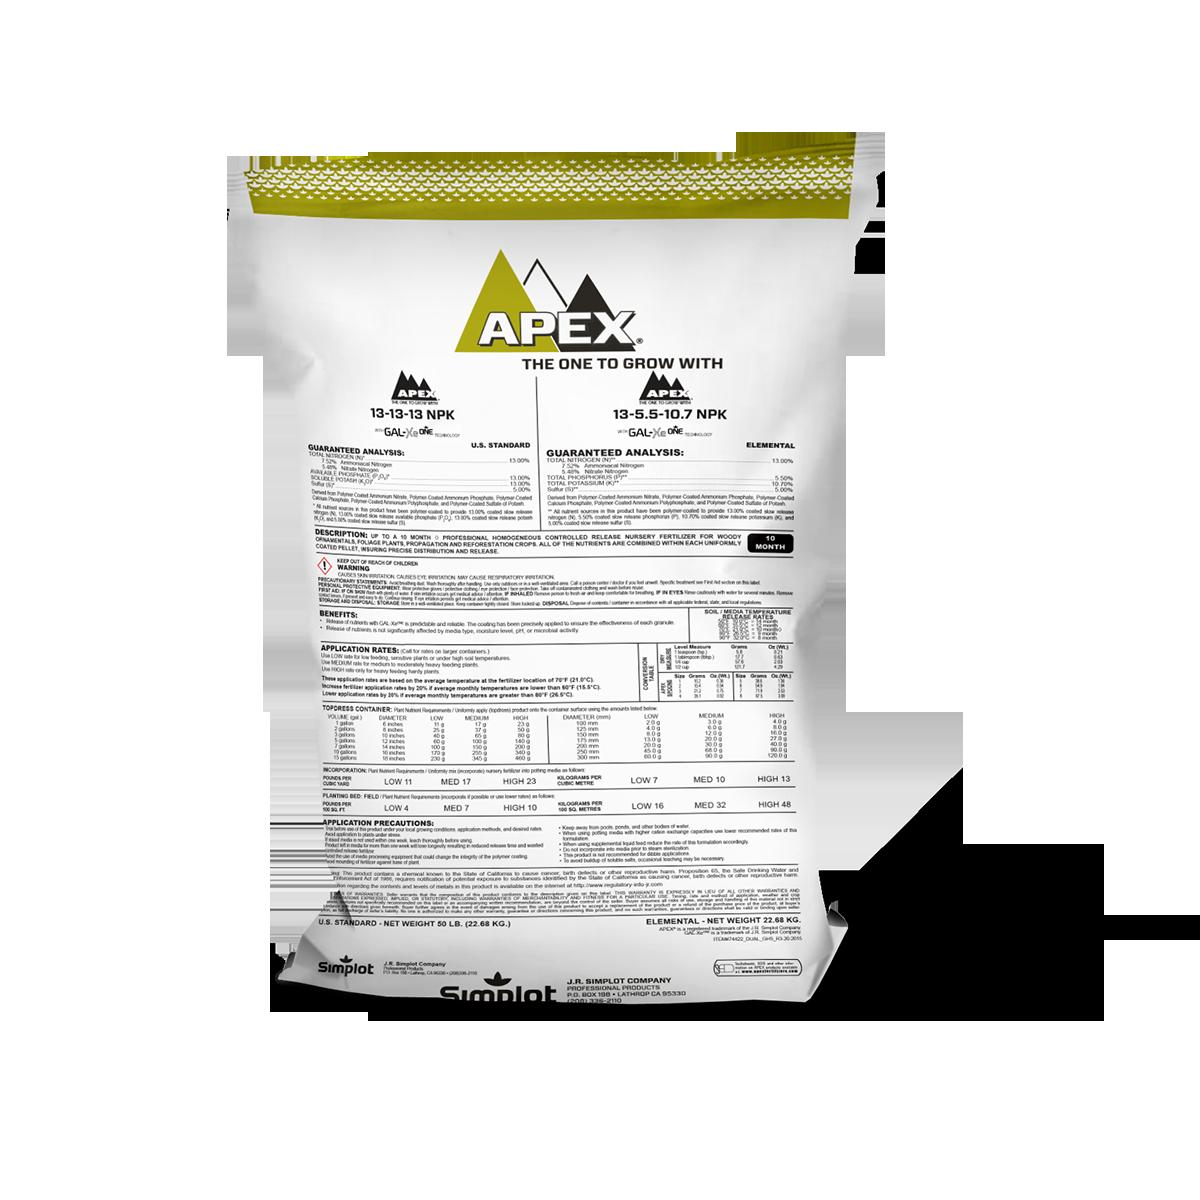 APEX-13-13-13 NPK Nursery Fertilizer